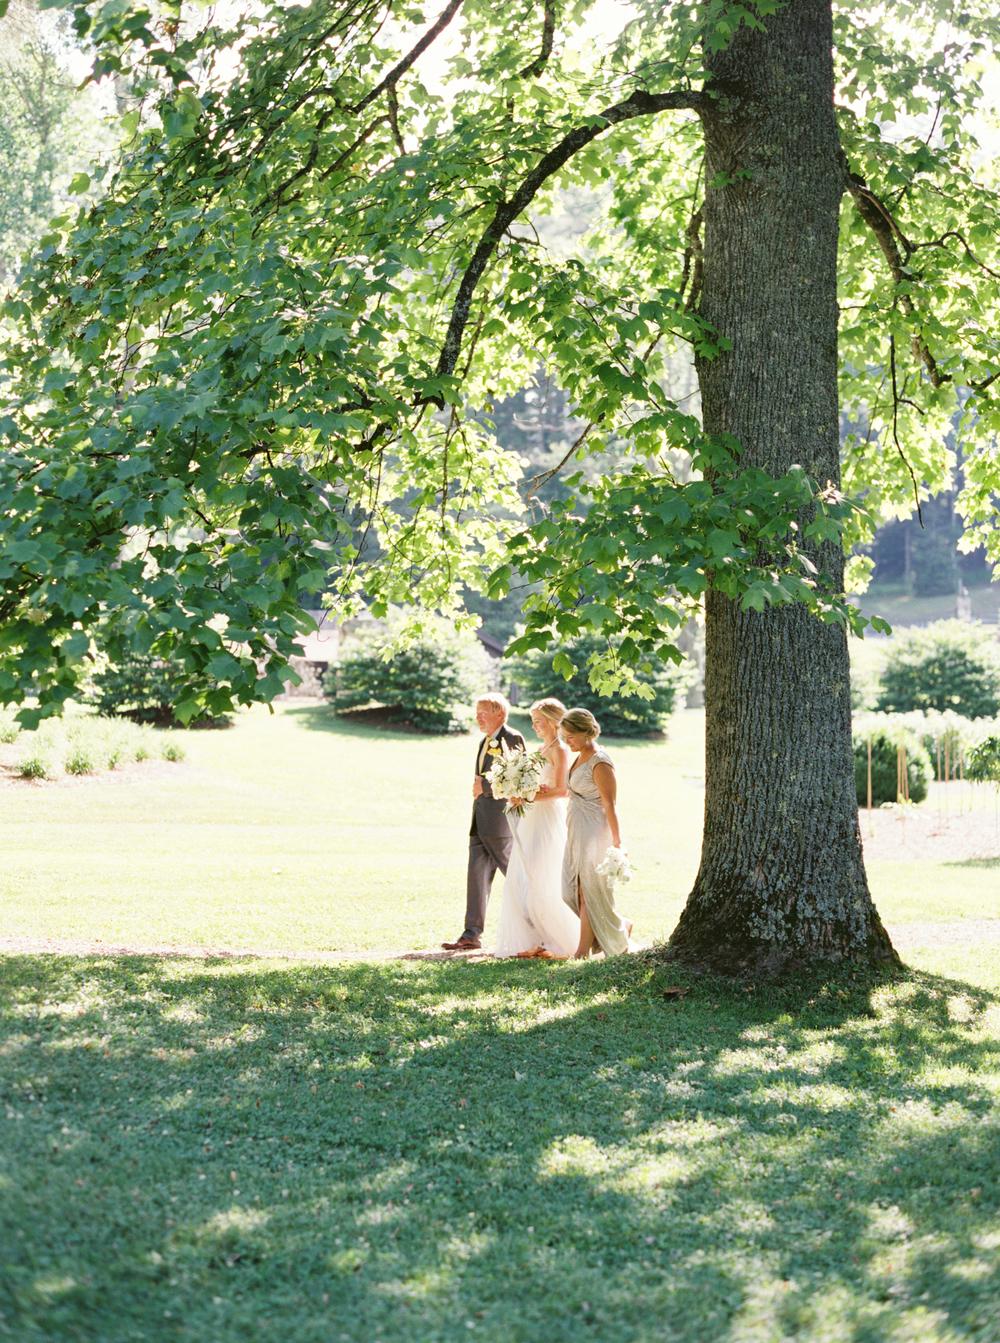 Jen & Russel | Sawyer Baird (39 of 63).JPG